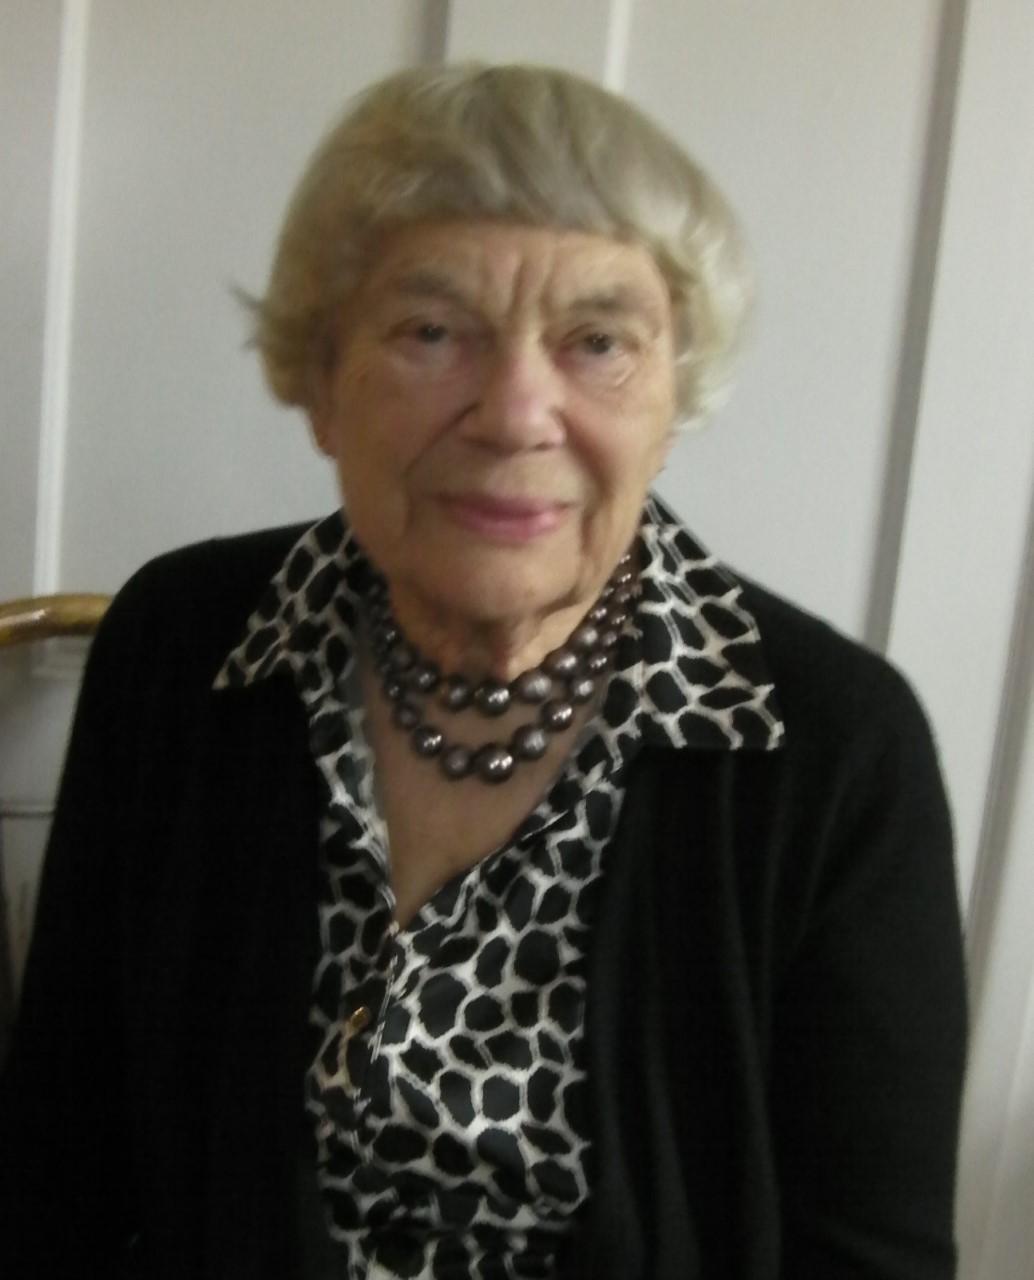 Hilary Townsend